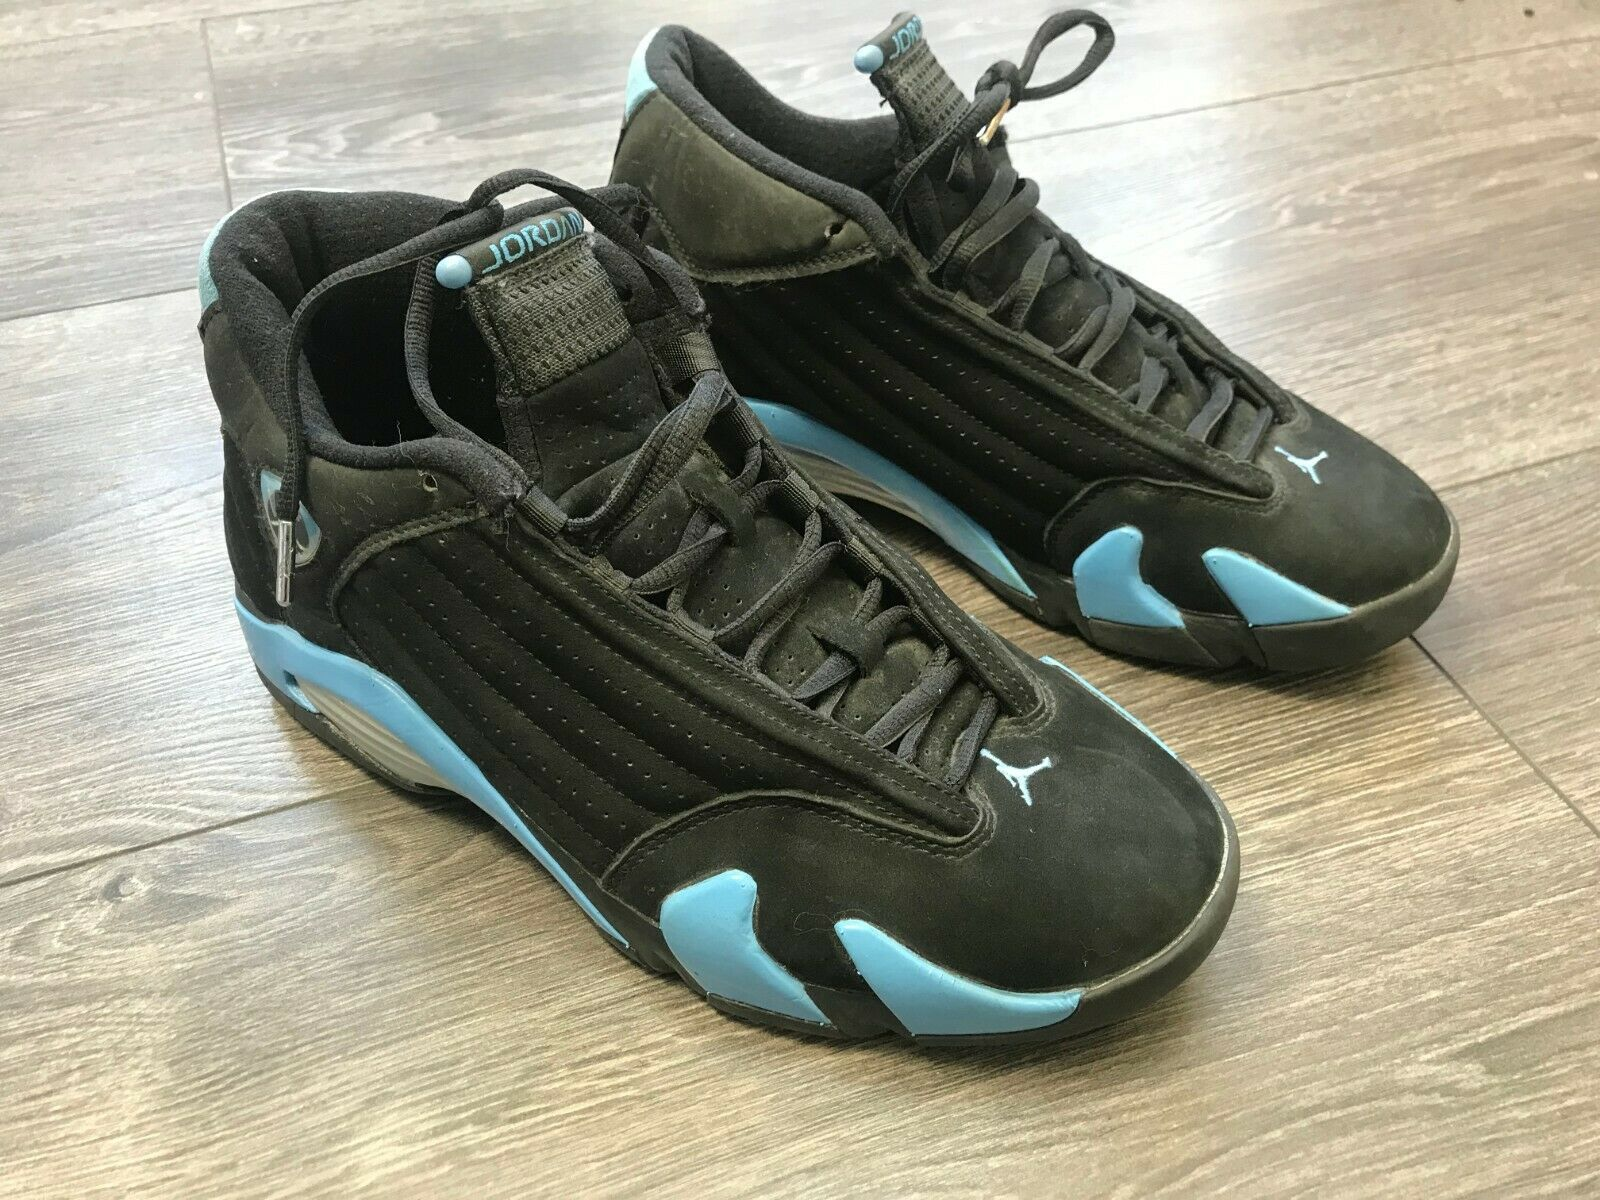 Nike Air Jordan 14 Trainers UK 8 (2005) XIV